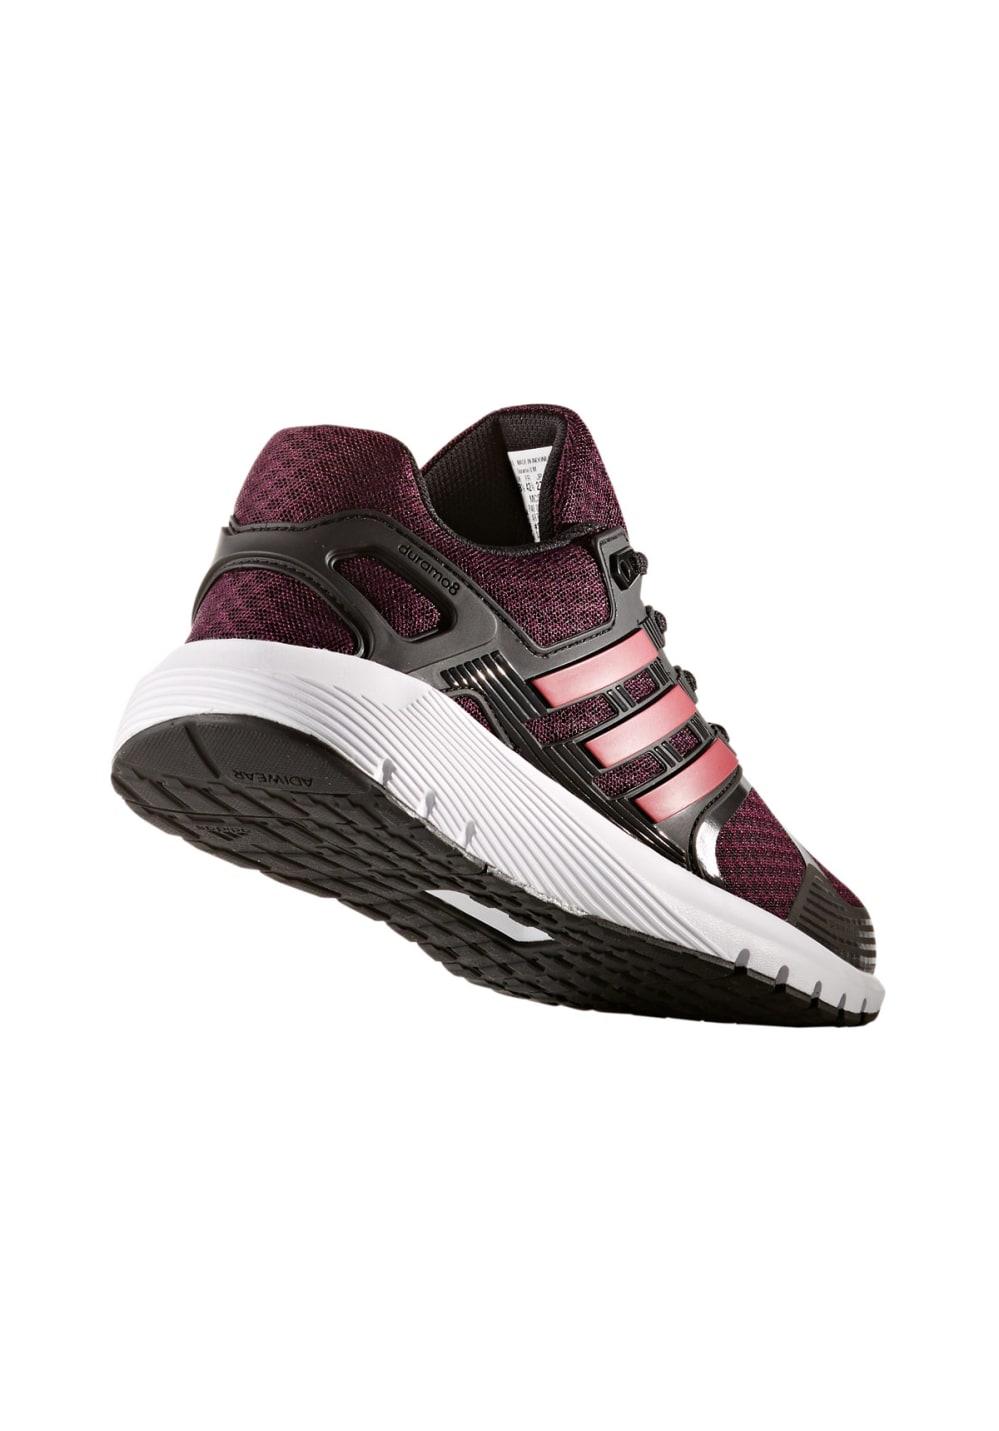 adidas Duramo 8 - Laufschuhe für Damen - Rot